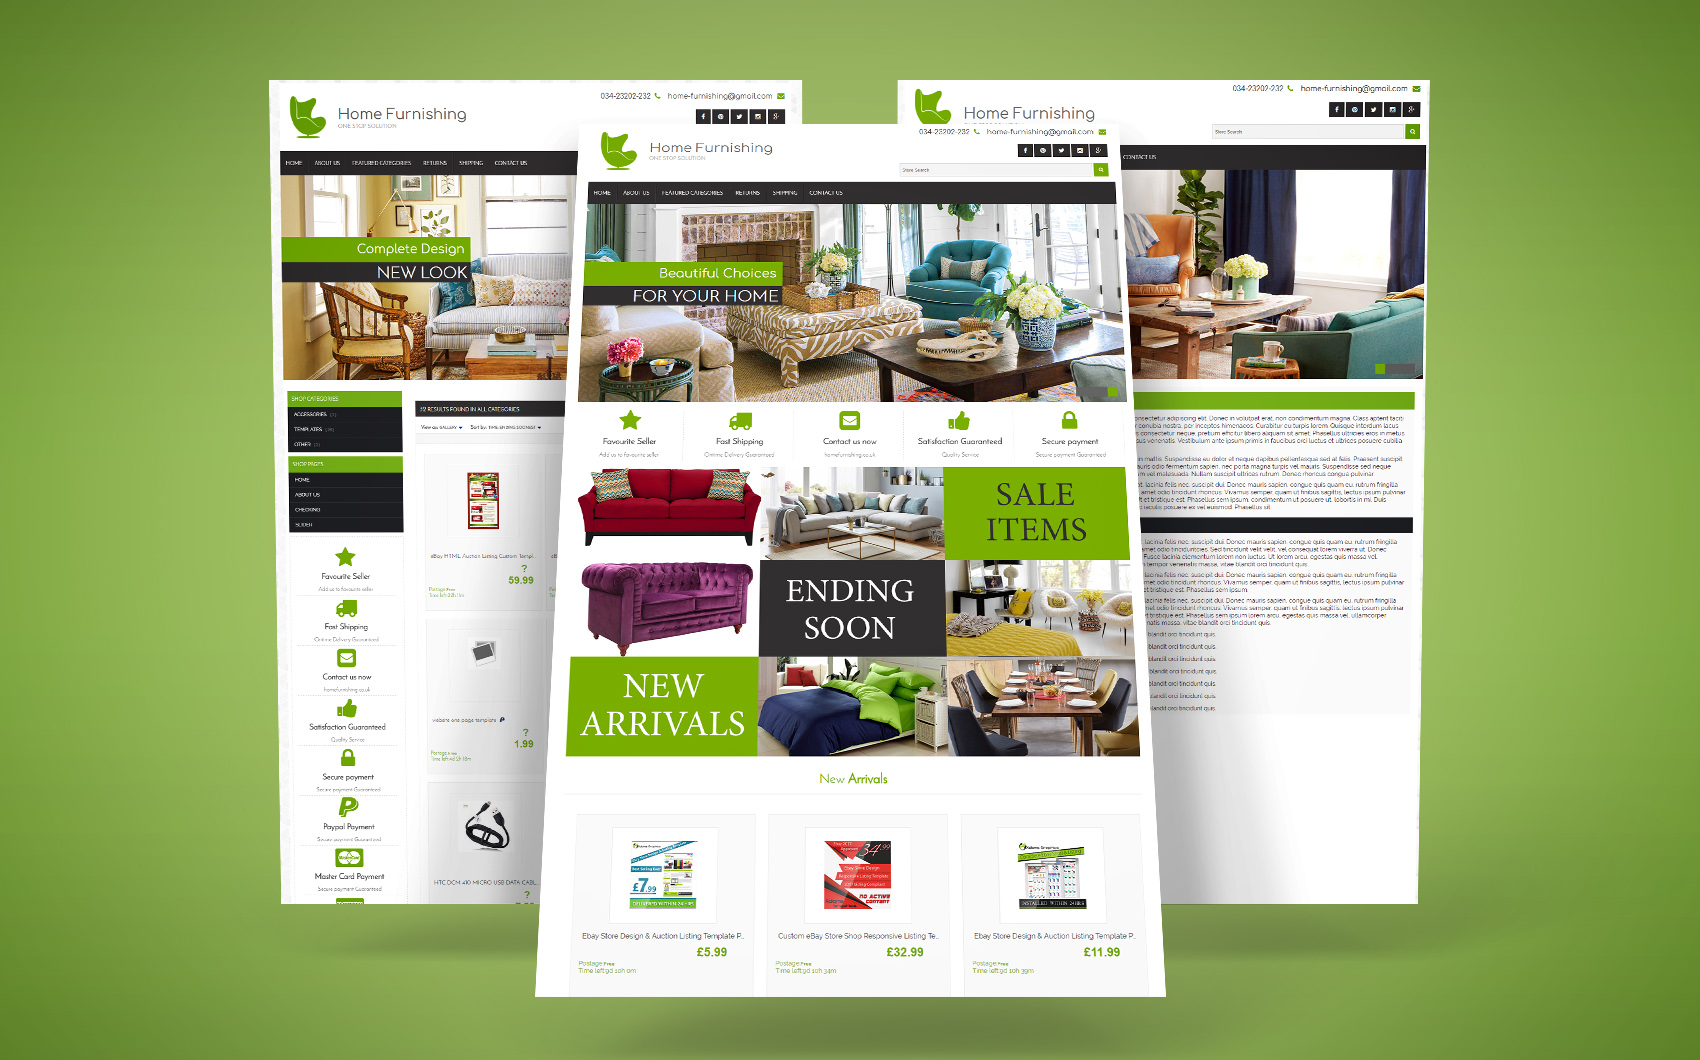 Home Furnishing EBay Template Big Screenshot